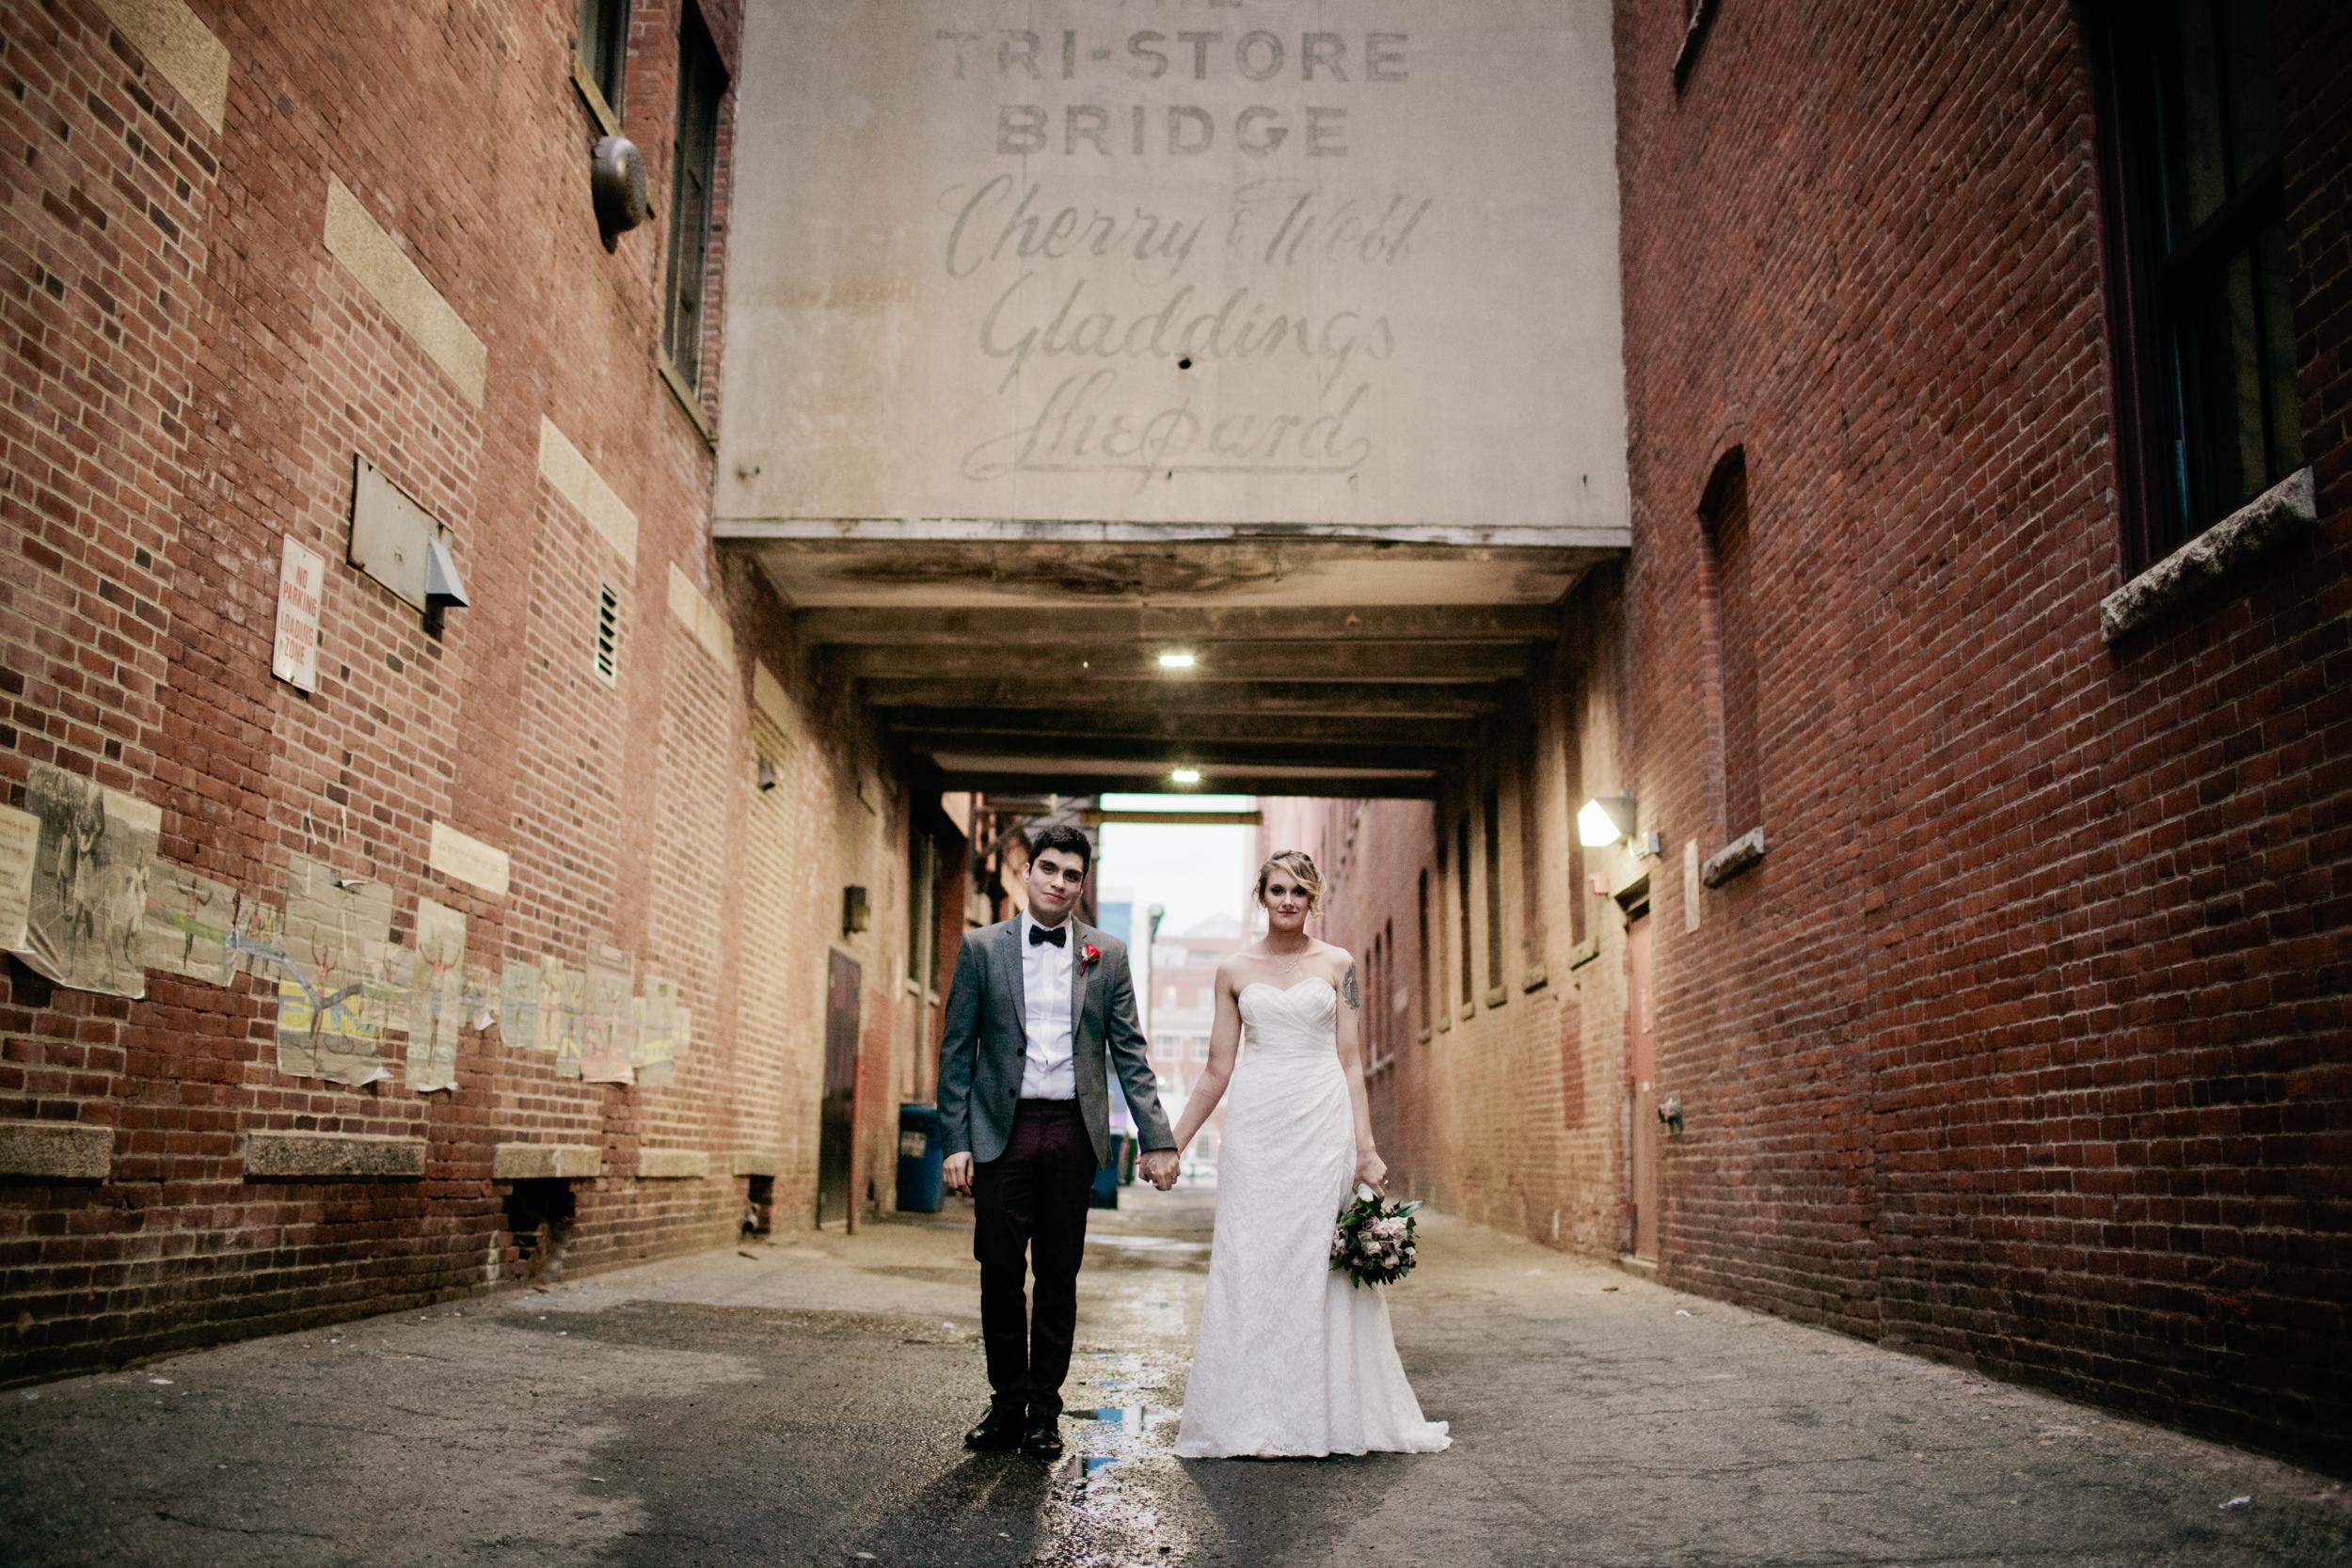 providence-wedding-photographer-111.jpg